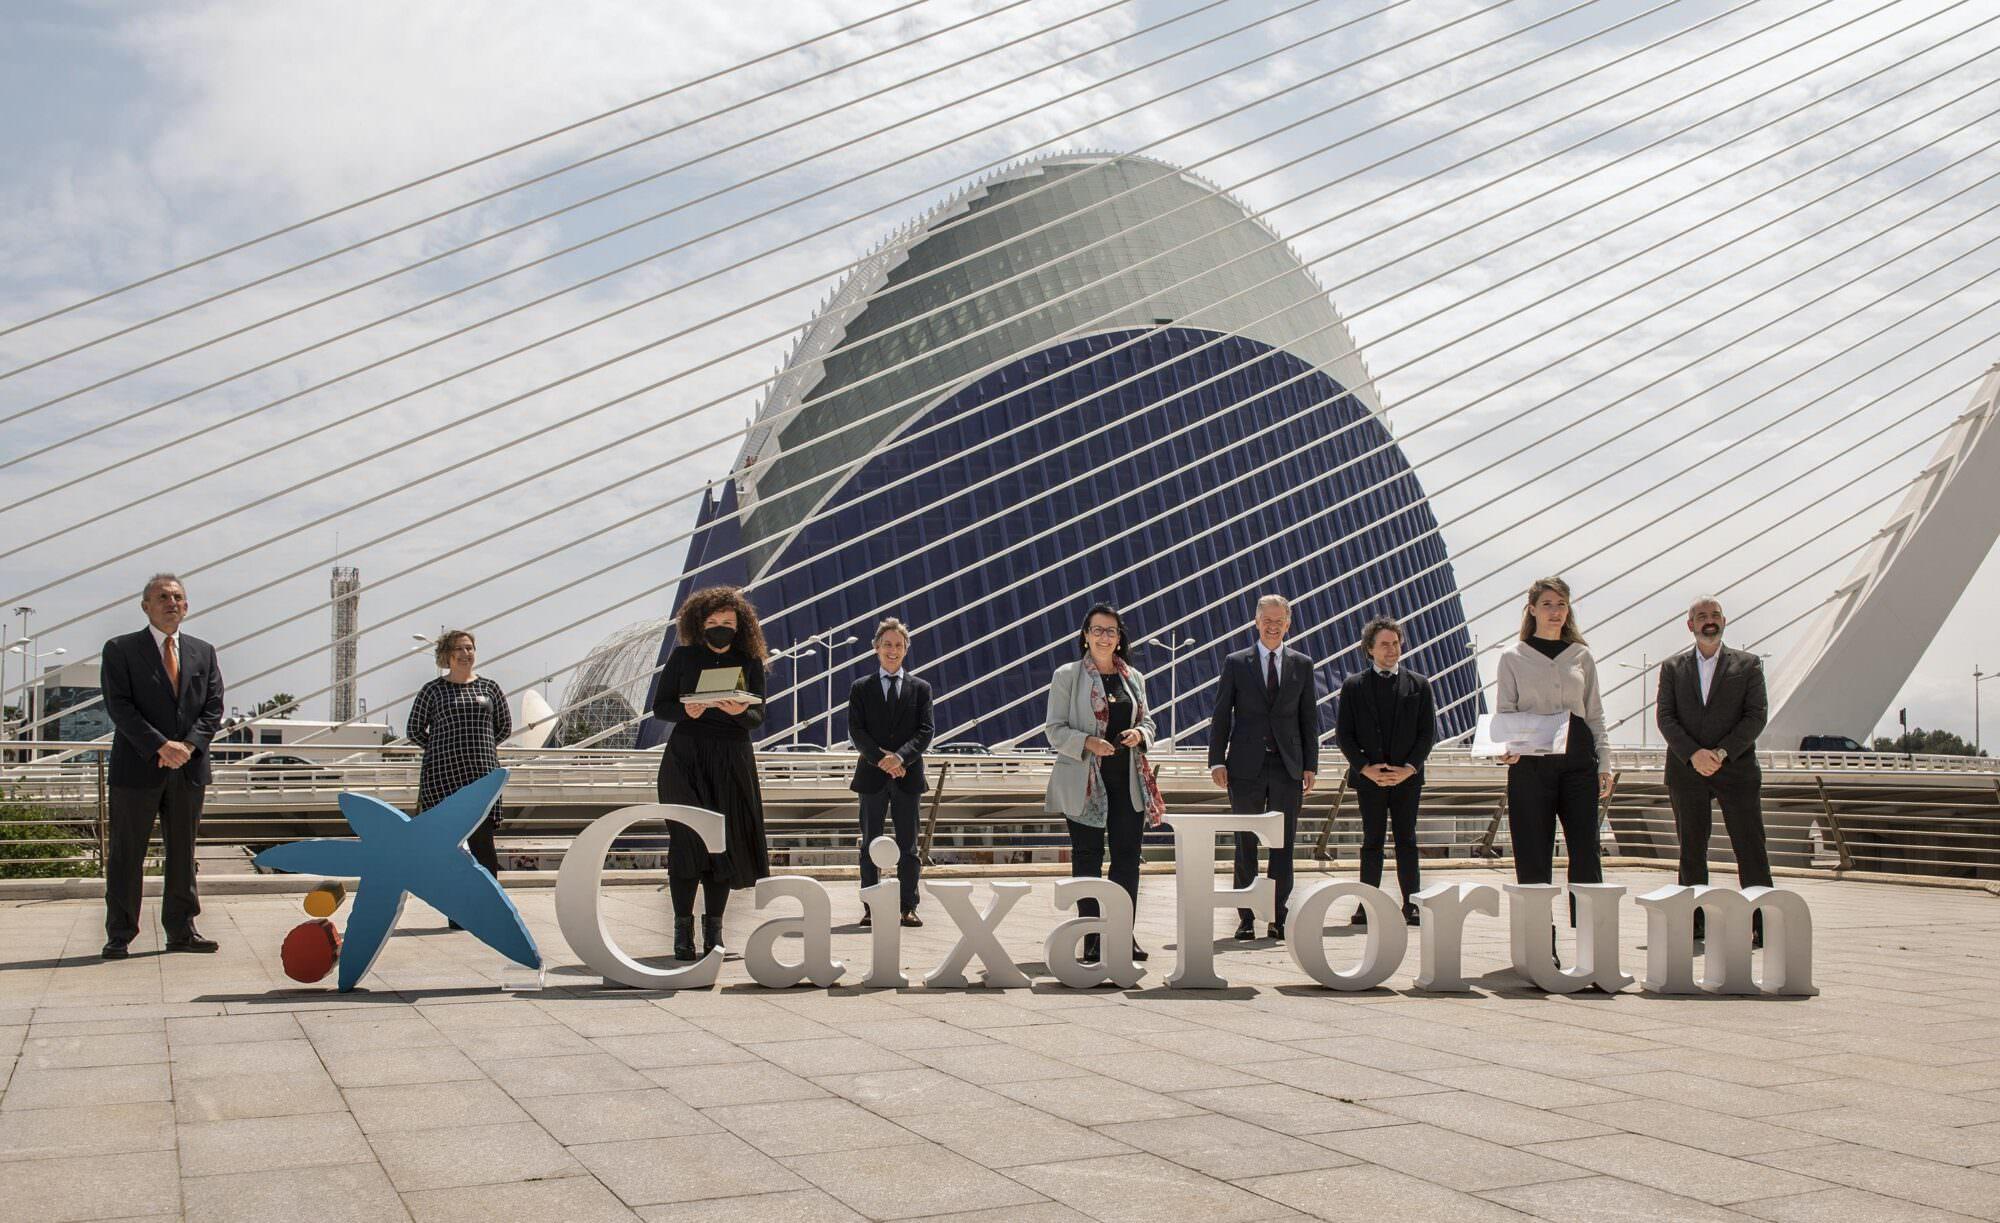 CaixaForum València